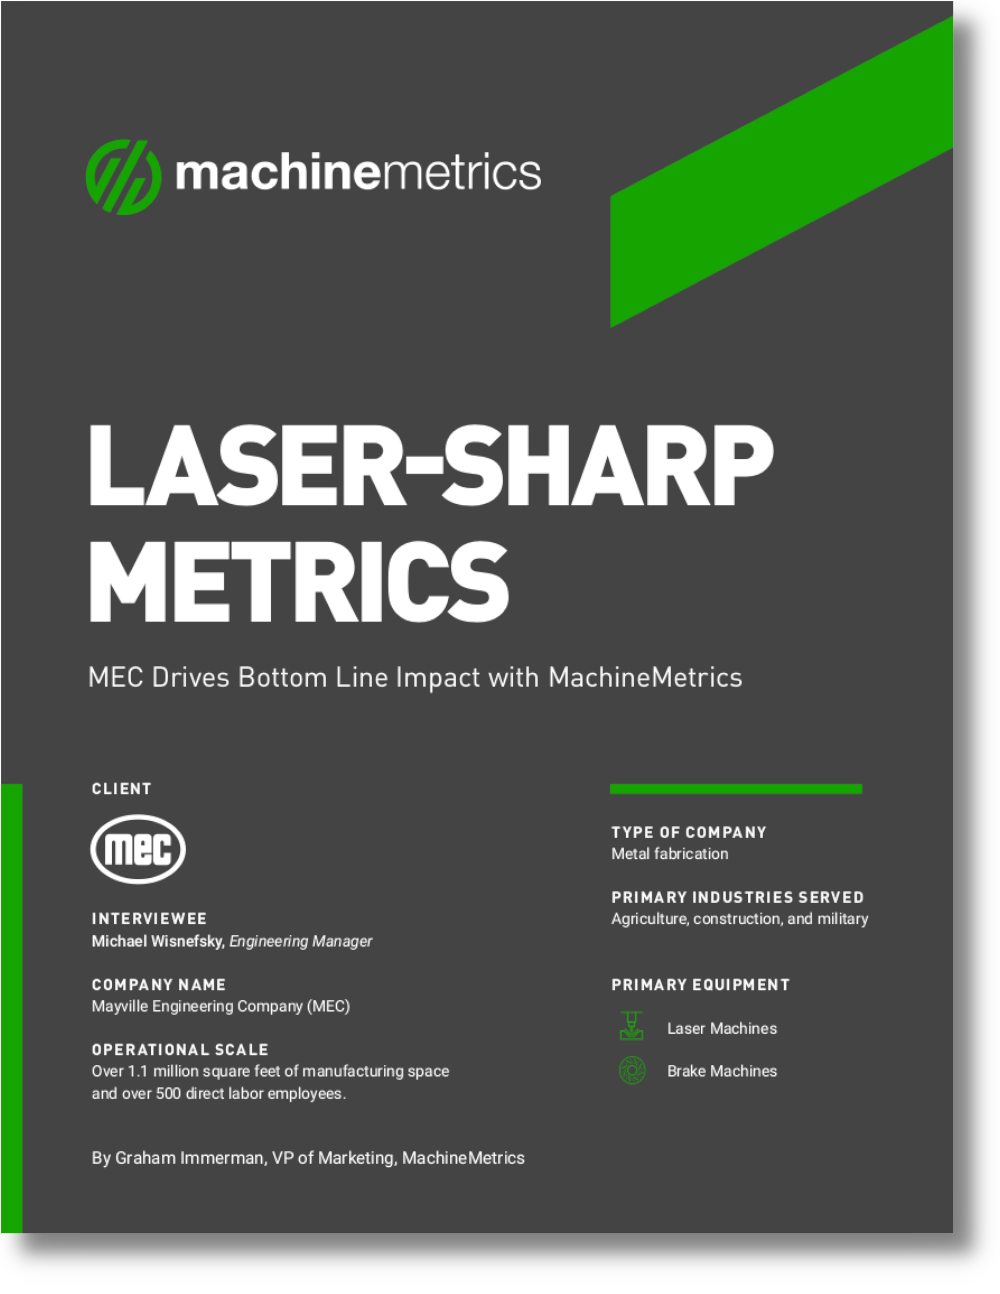 Laser-Sharp Metrics: MEC Drives Bottom Line Impact with MachineMetrics